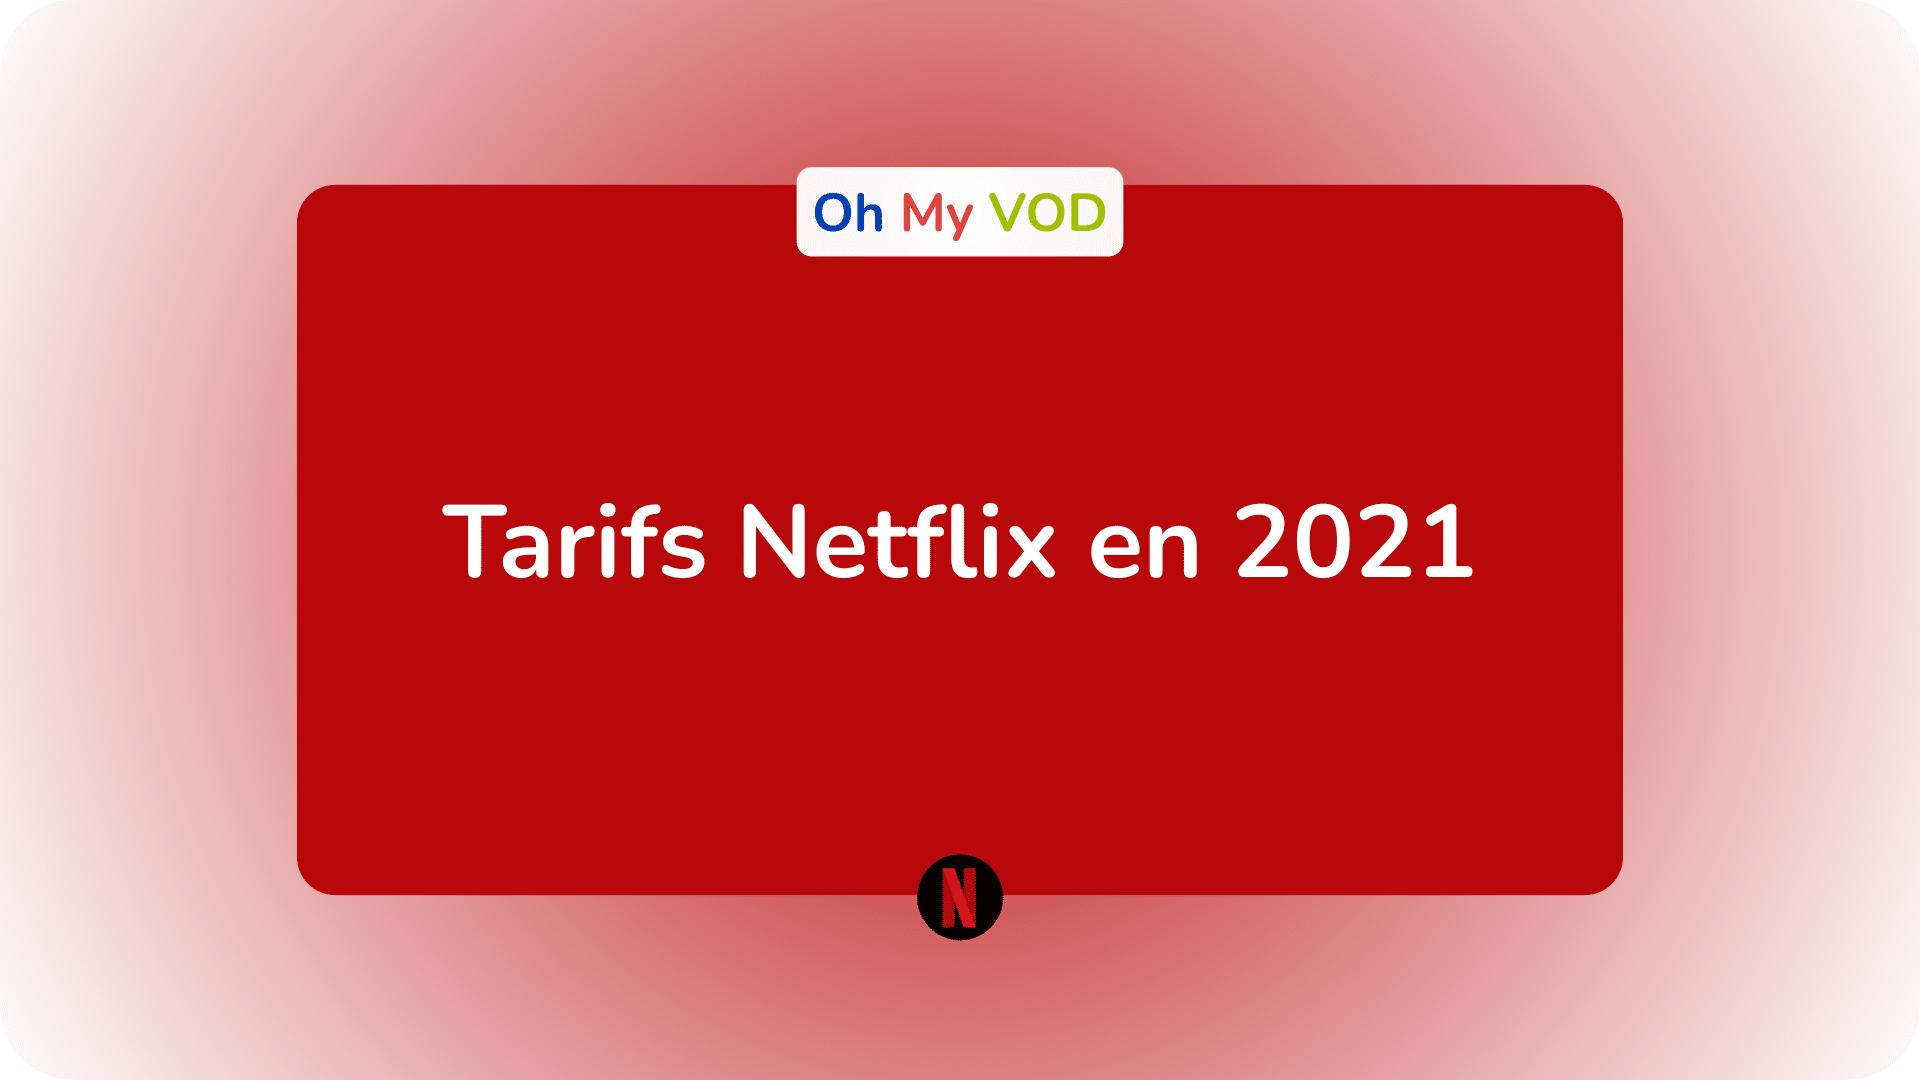 Tarifs Netflix 2021 Toutes Les Tarifs De Netflix En 2021 Oh My Vod